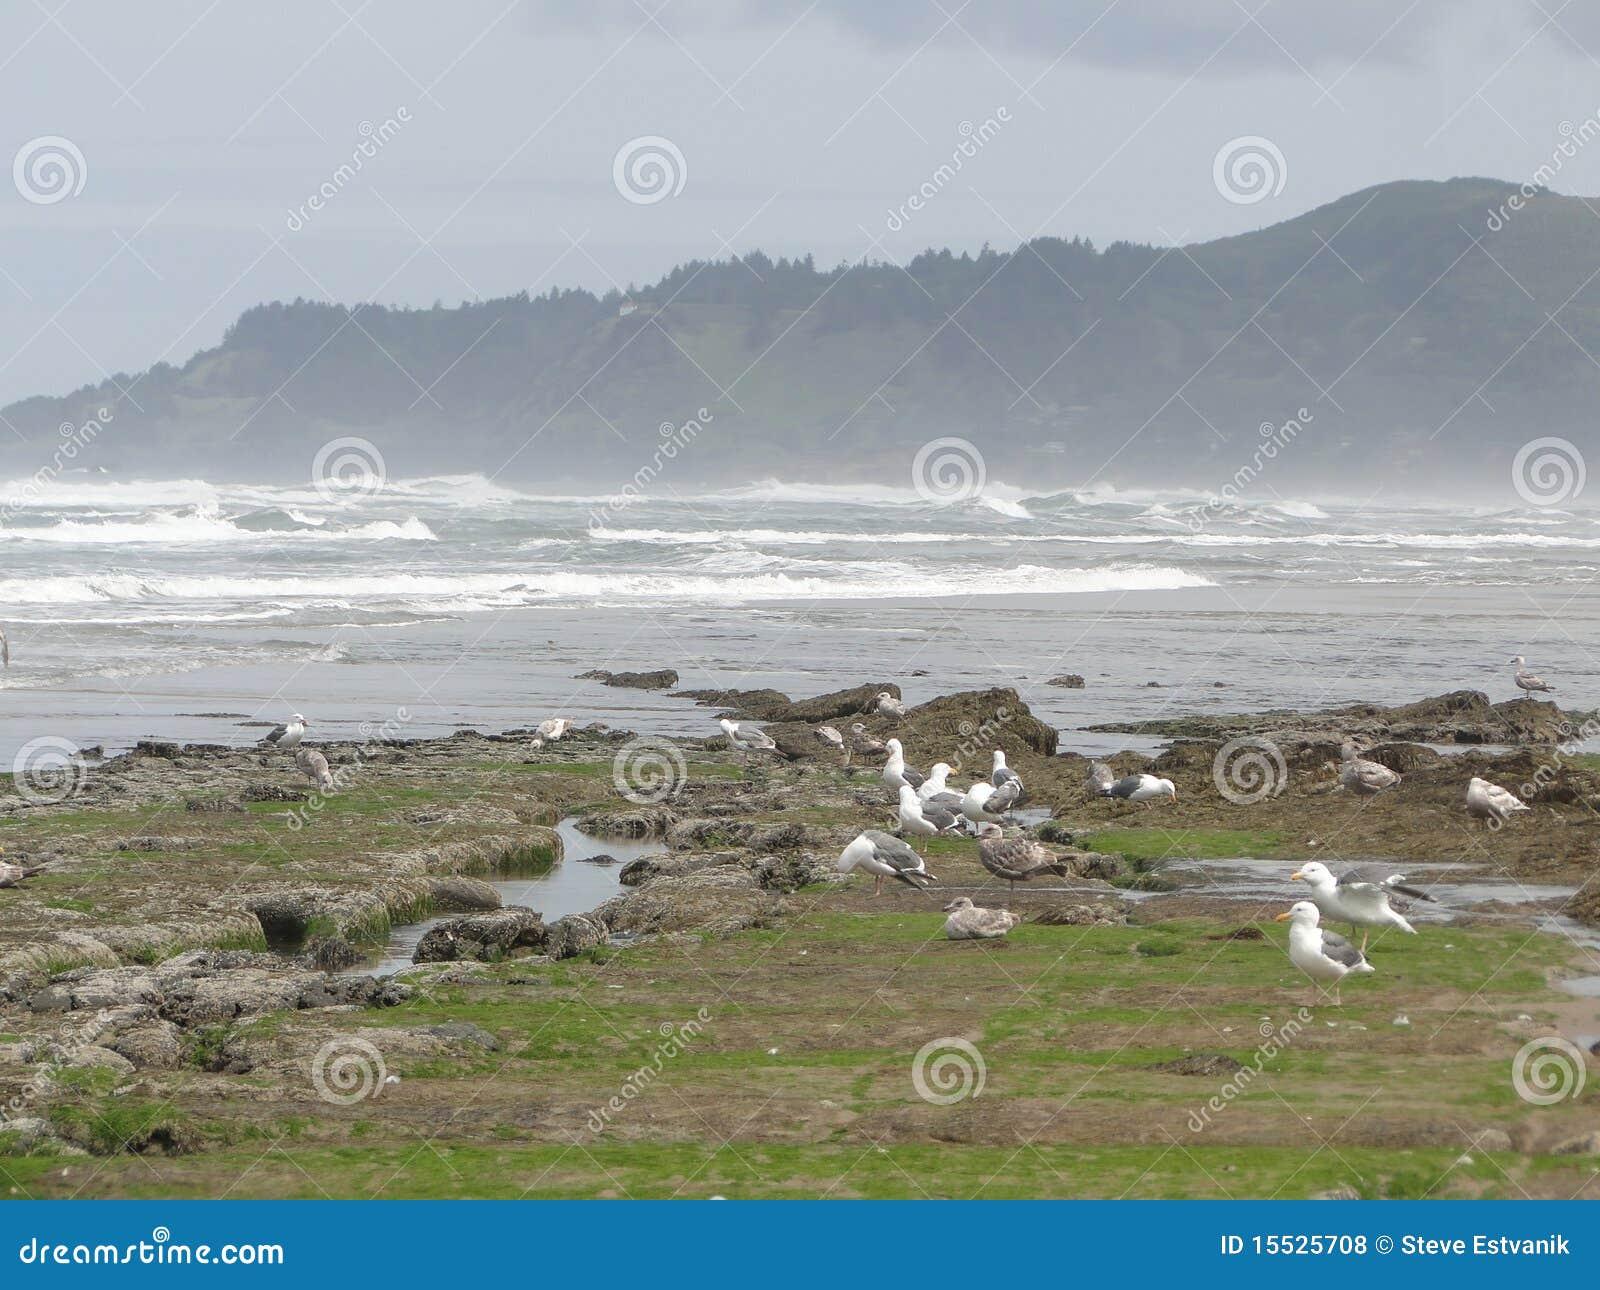 Low tide, tide pools, gulls